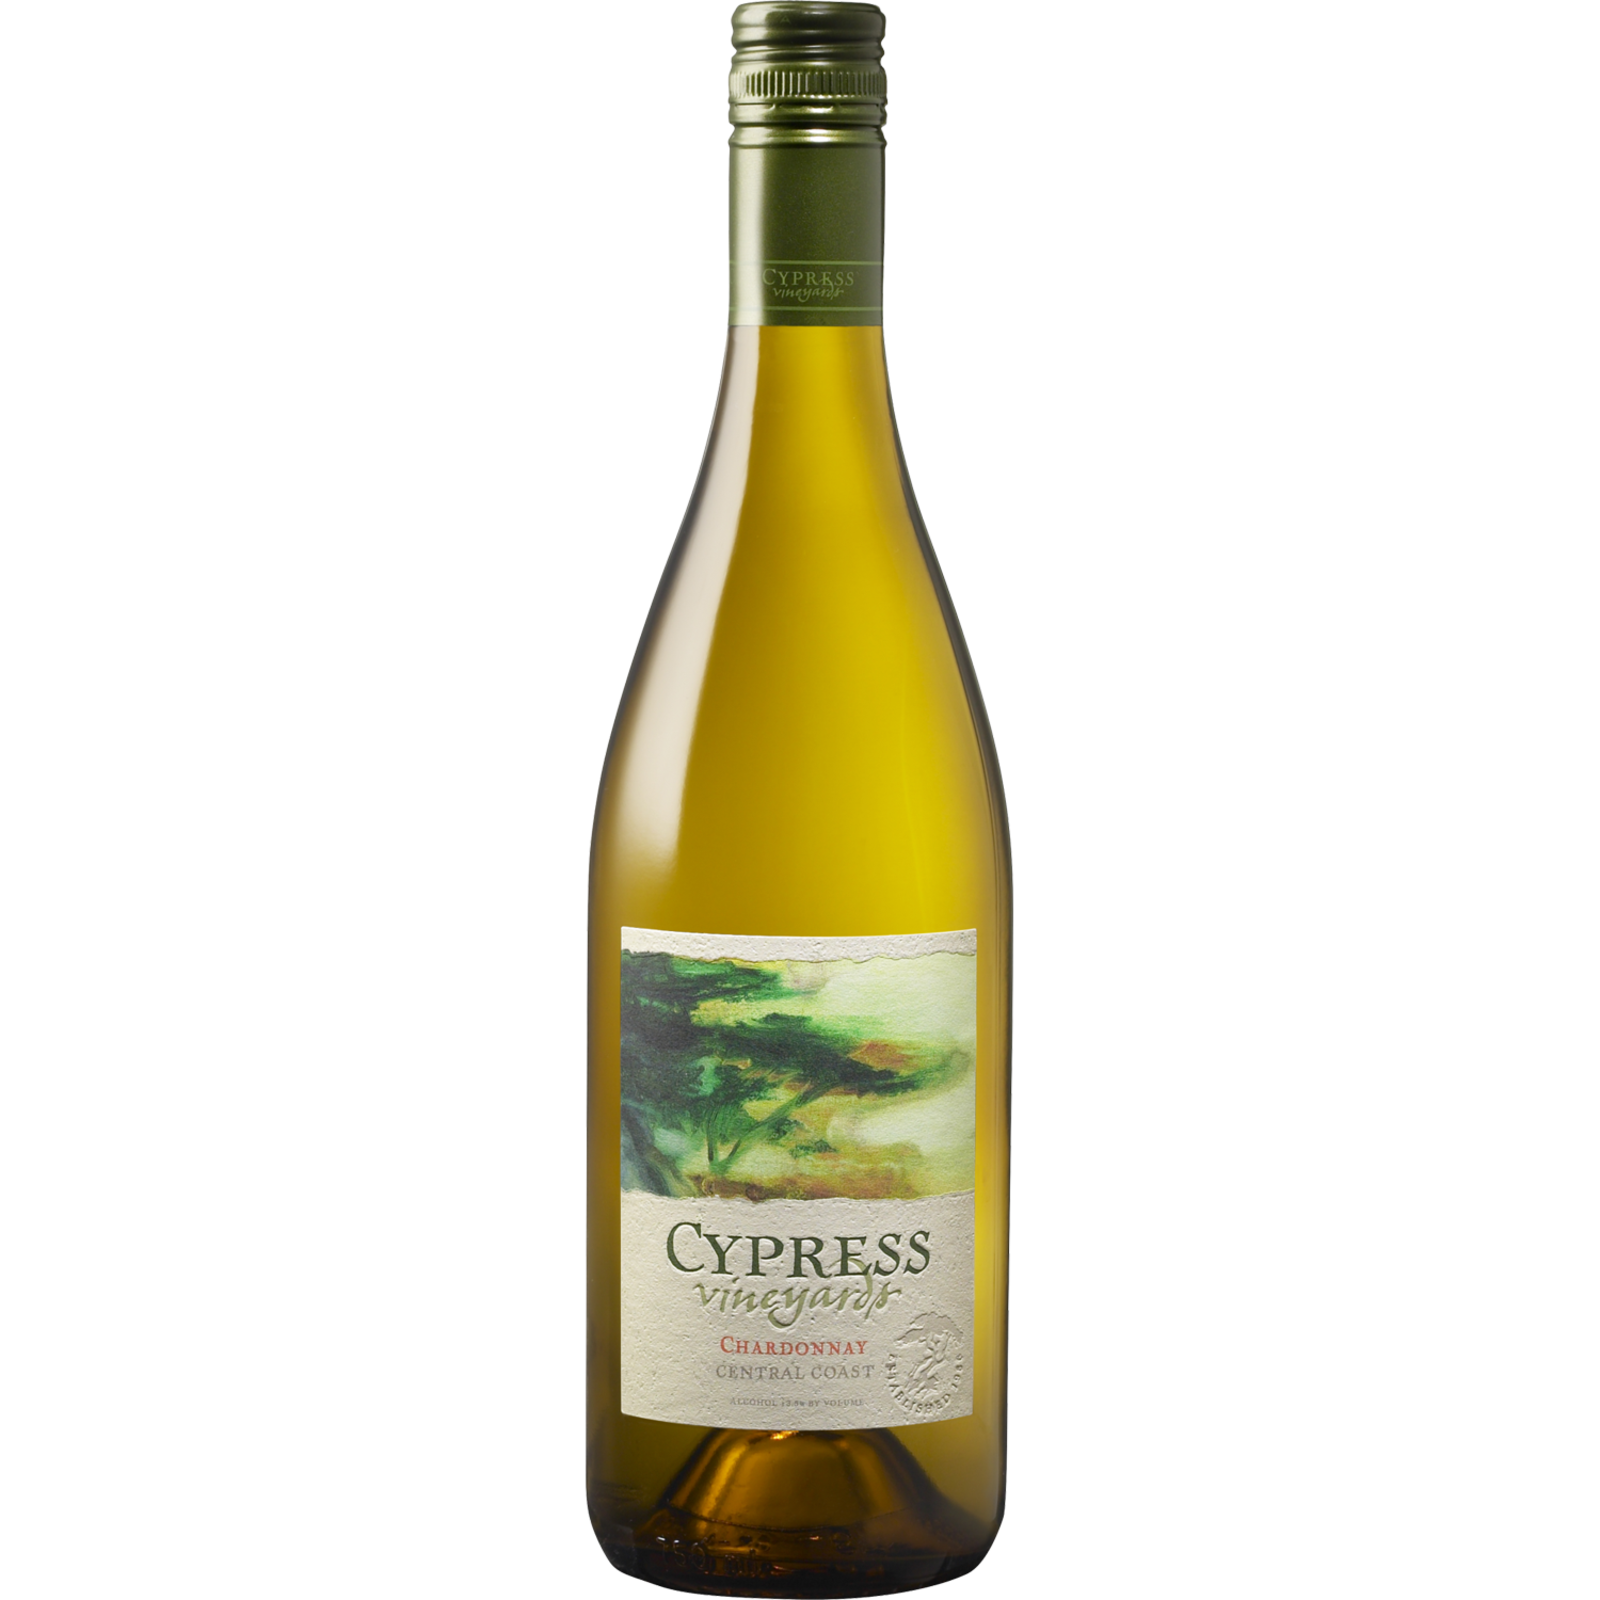 J Lohr Winery J Lohr Winery Chardonnay Cypress 2018